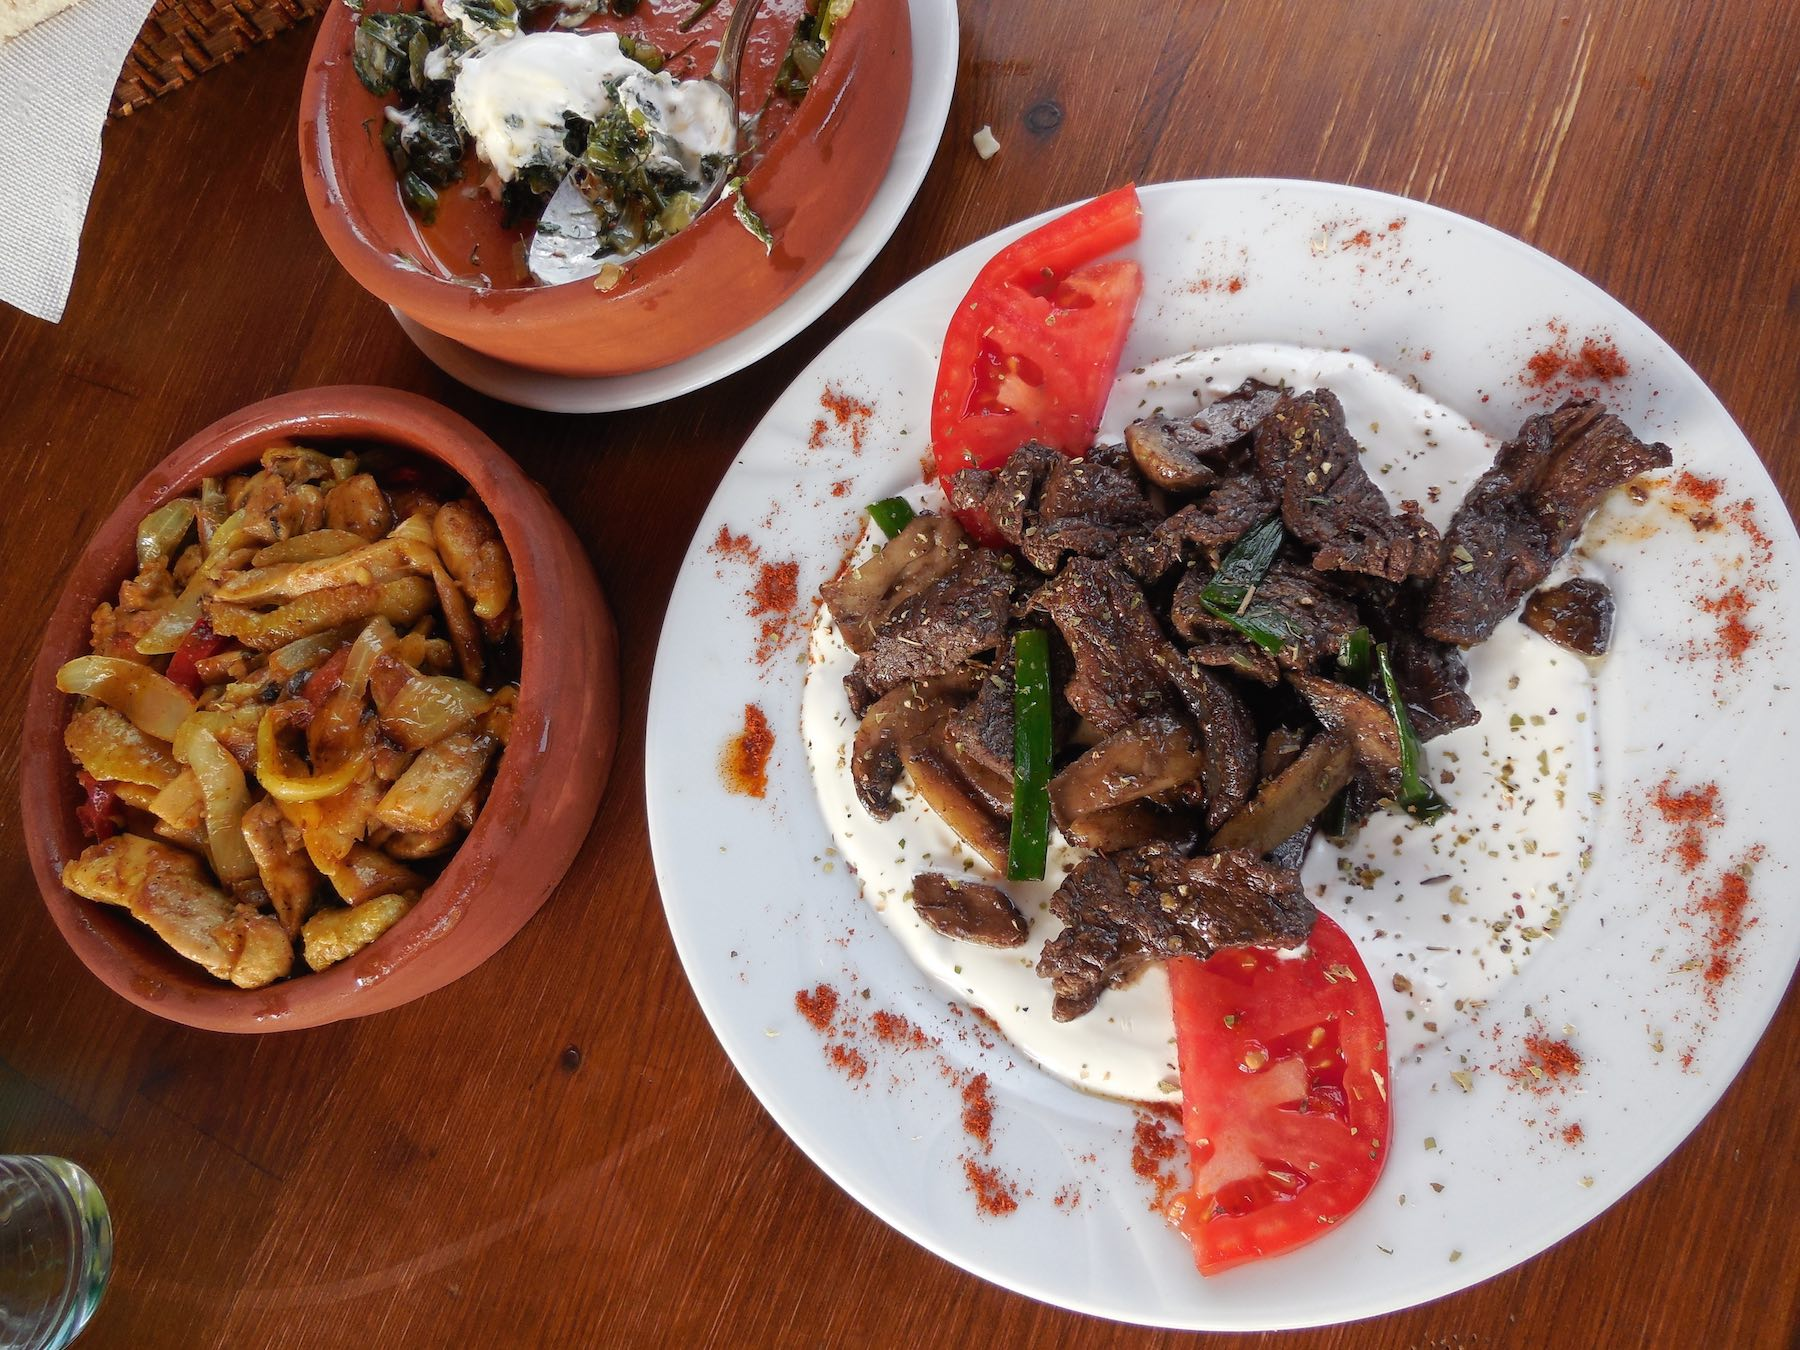 Kirkinca Kabobi (marinated beef) and chicken curry